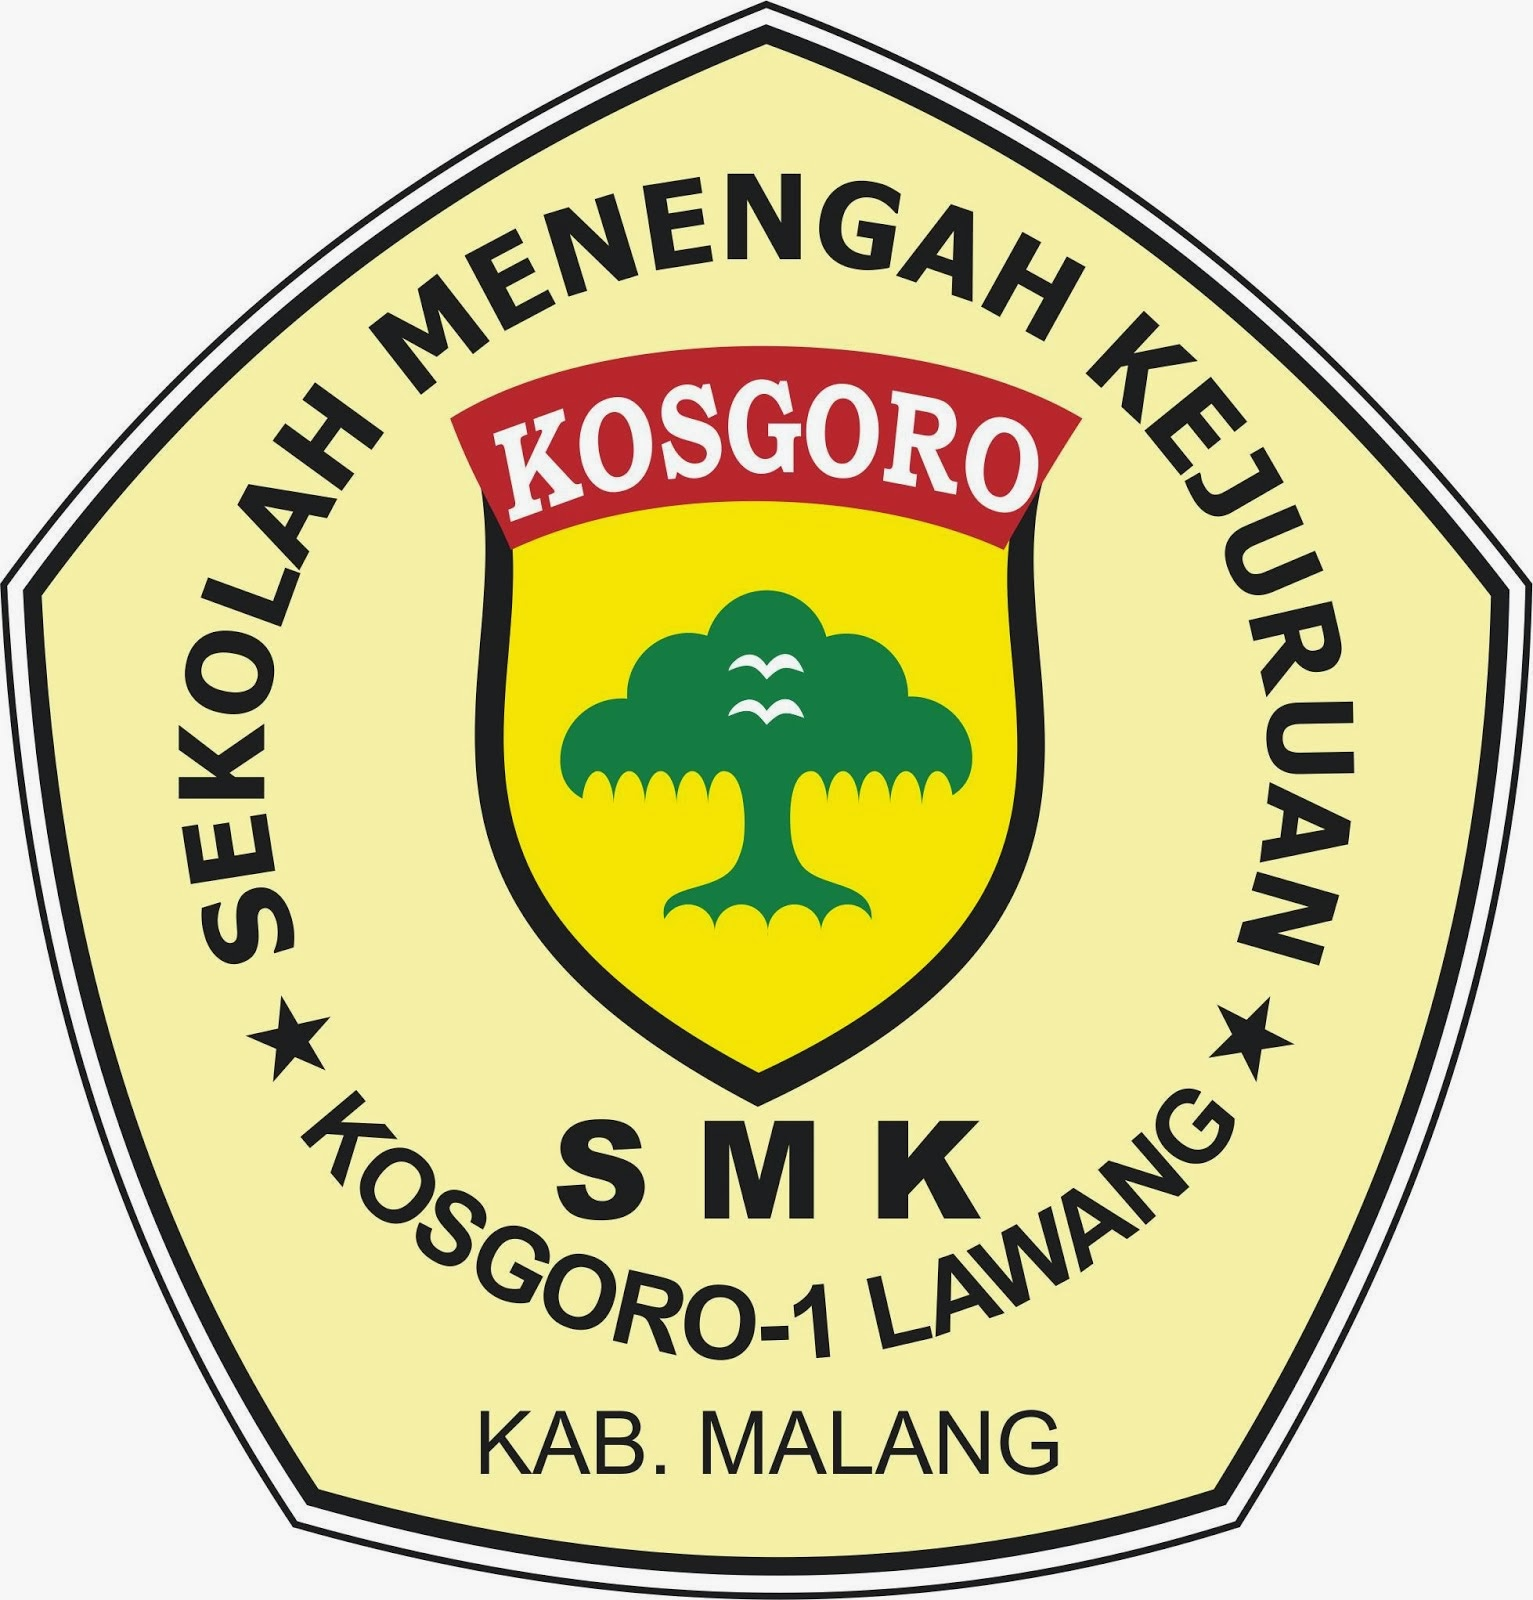 Logo SMK Kosgoro-1 Lawang